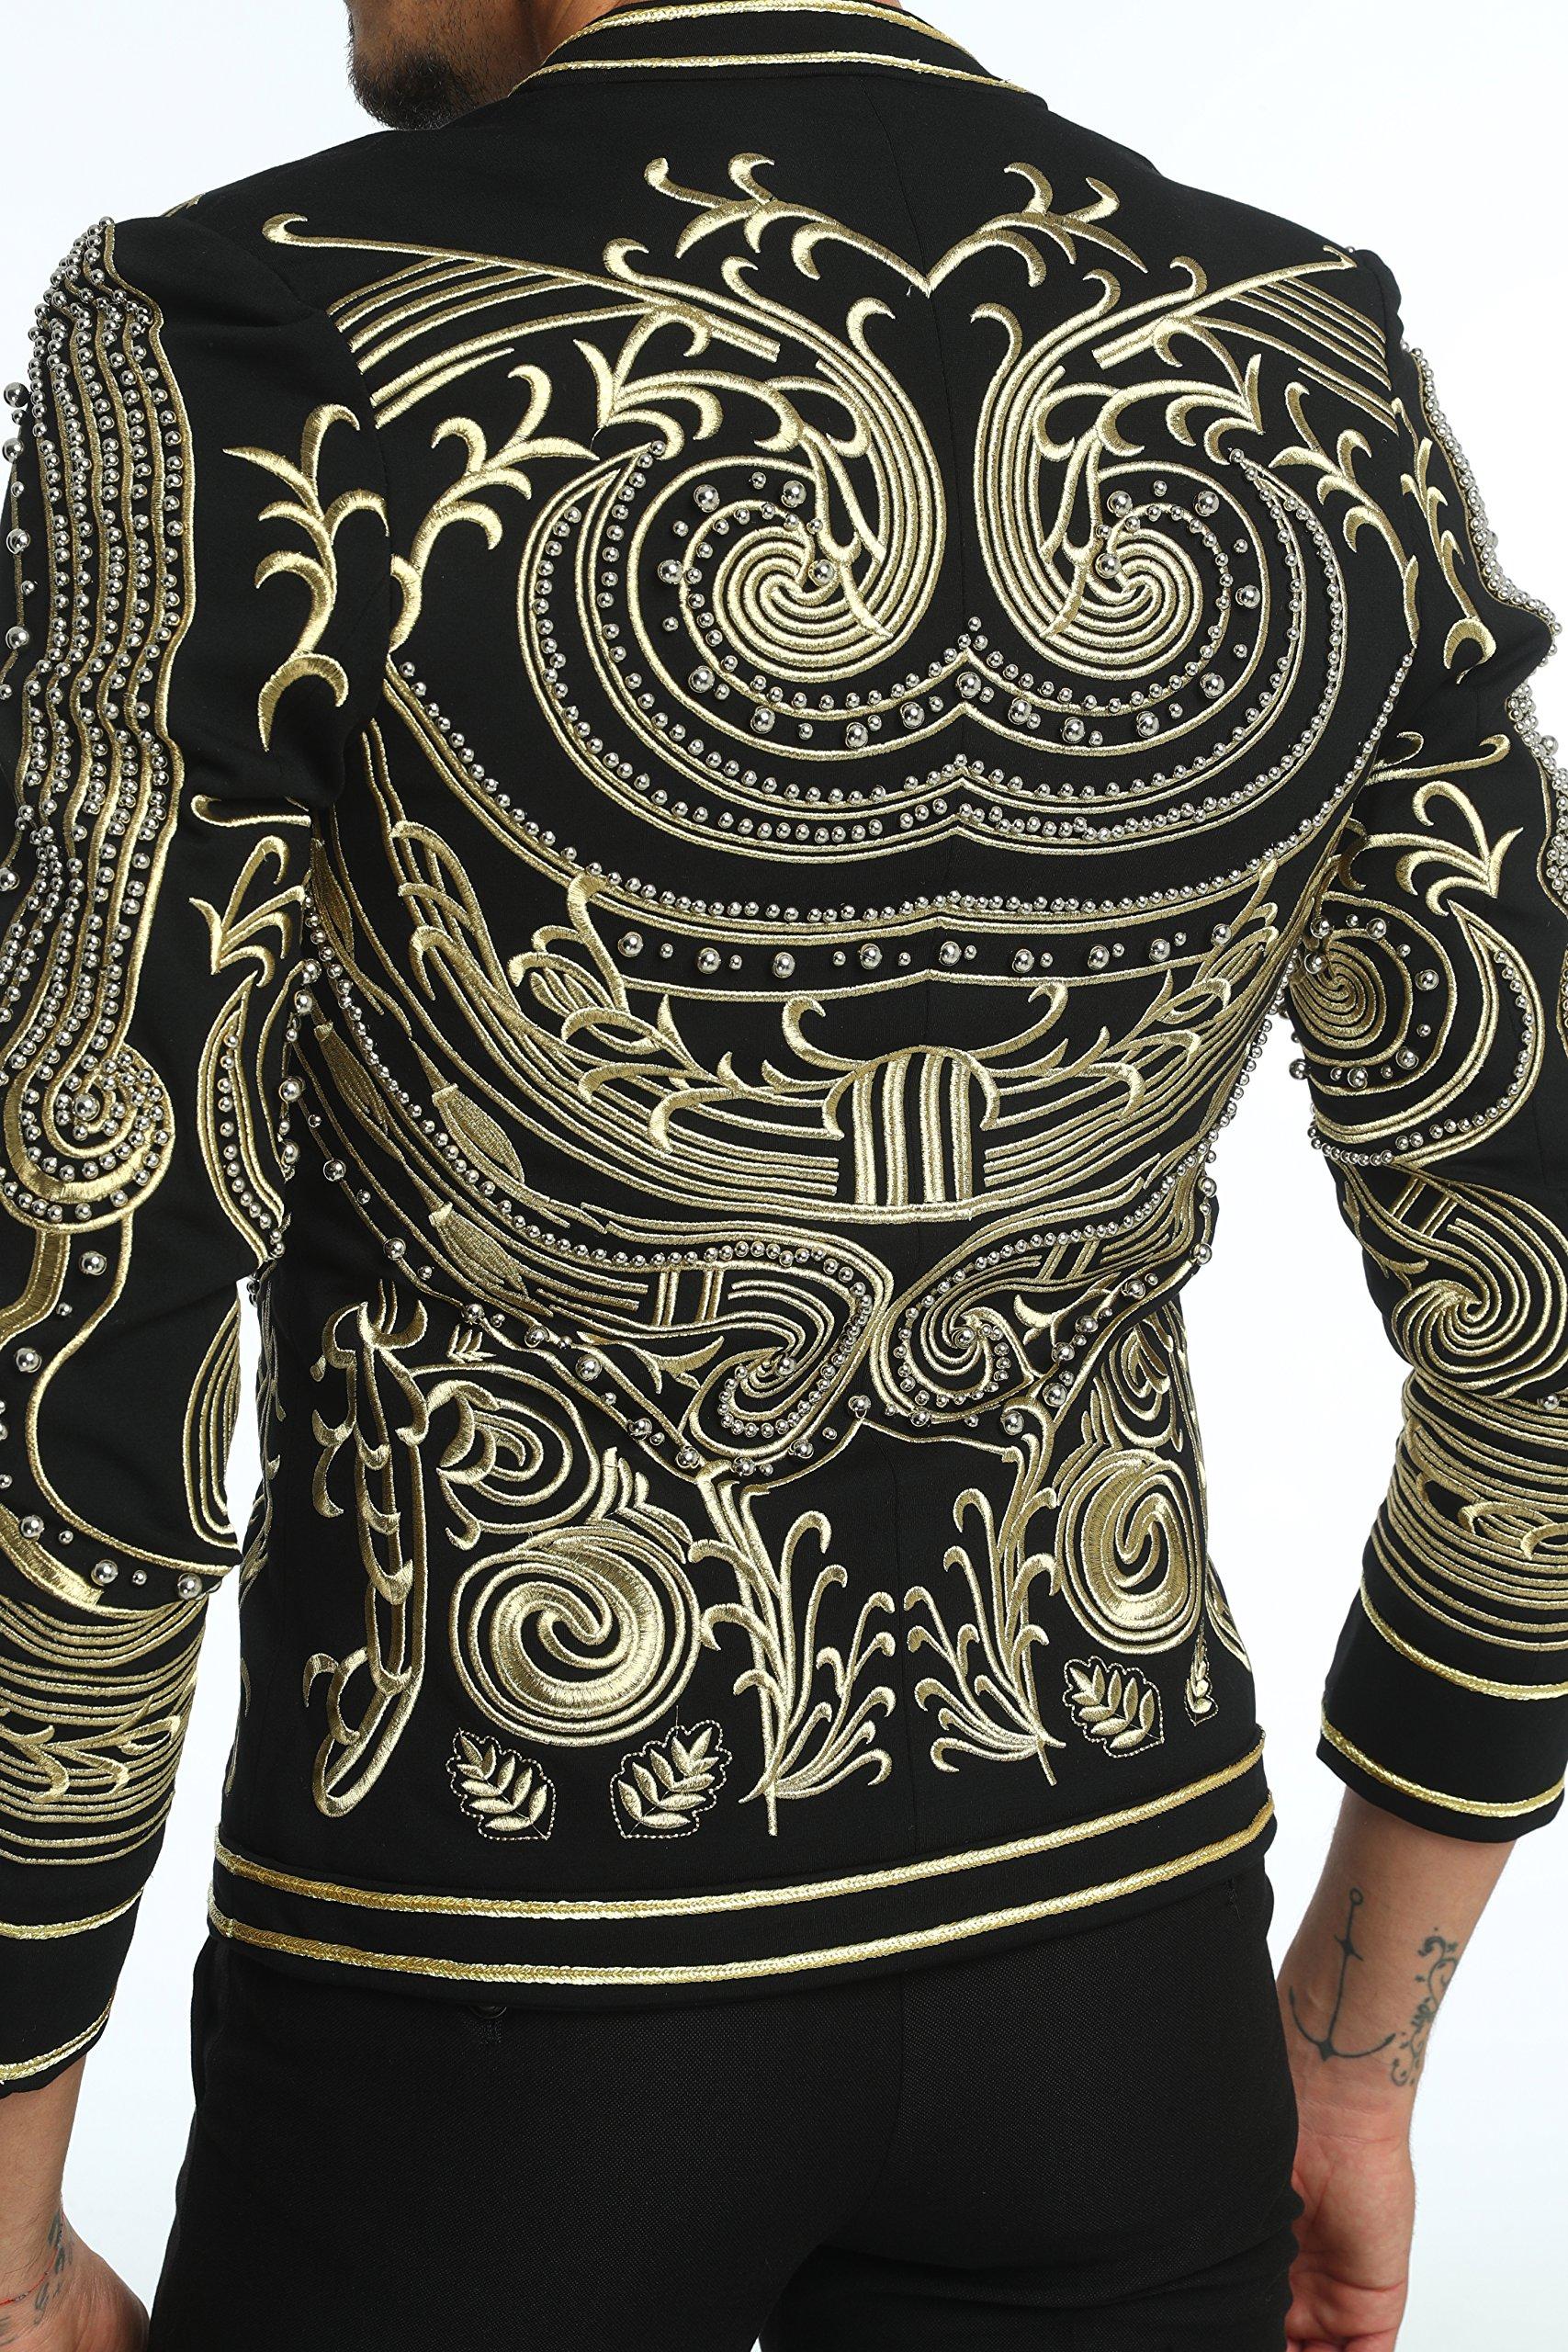 Pizoff Men's Luxury V-Neck Slim Fit Stylish Suit Blazer Jacket Long Sleeve Formal Dinner Dress AD001-02-L by Pizoff (Image #6)